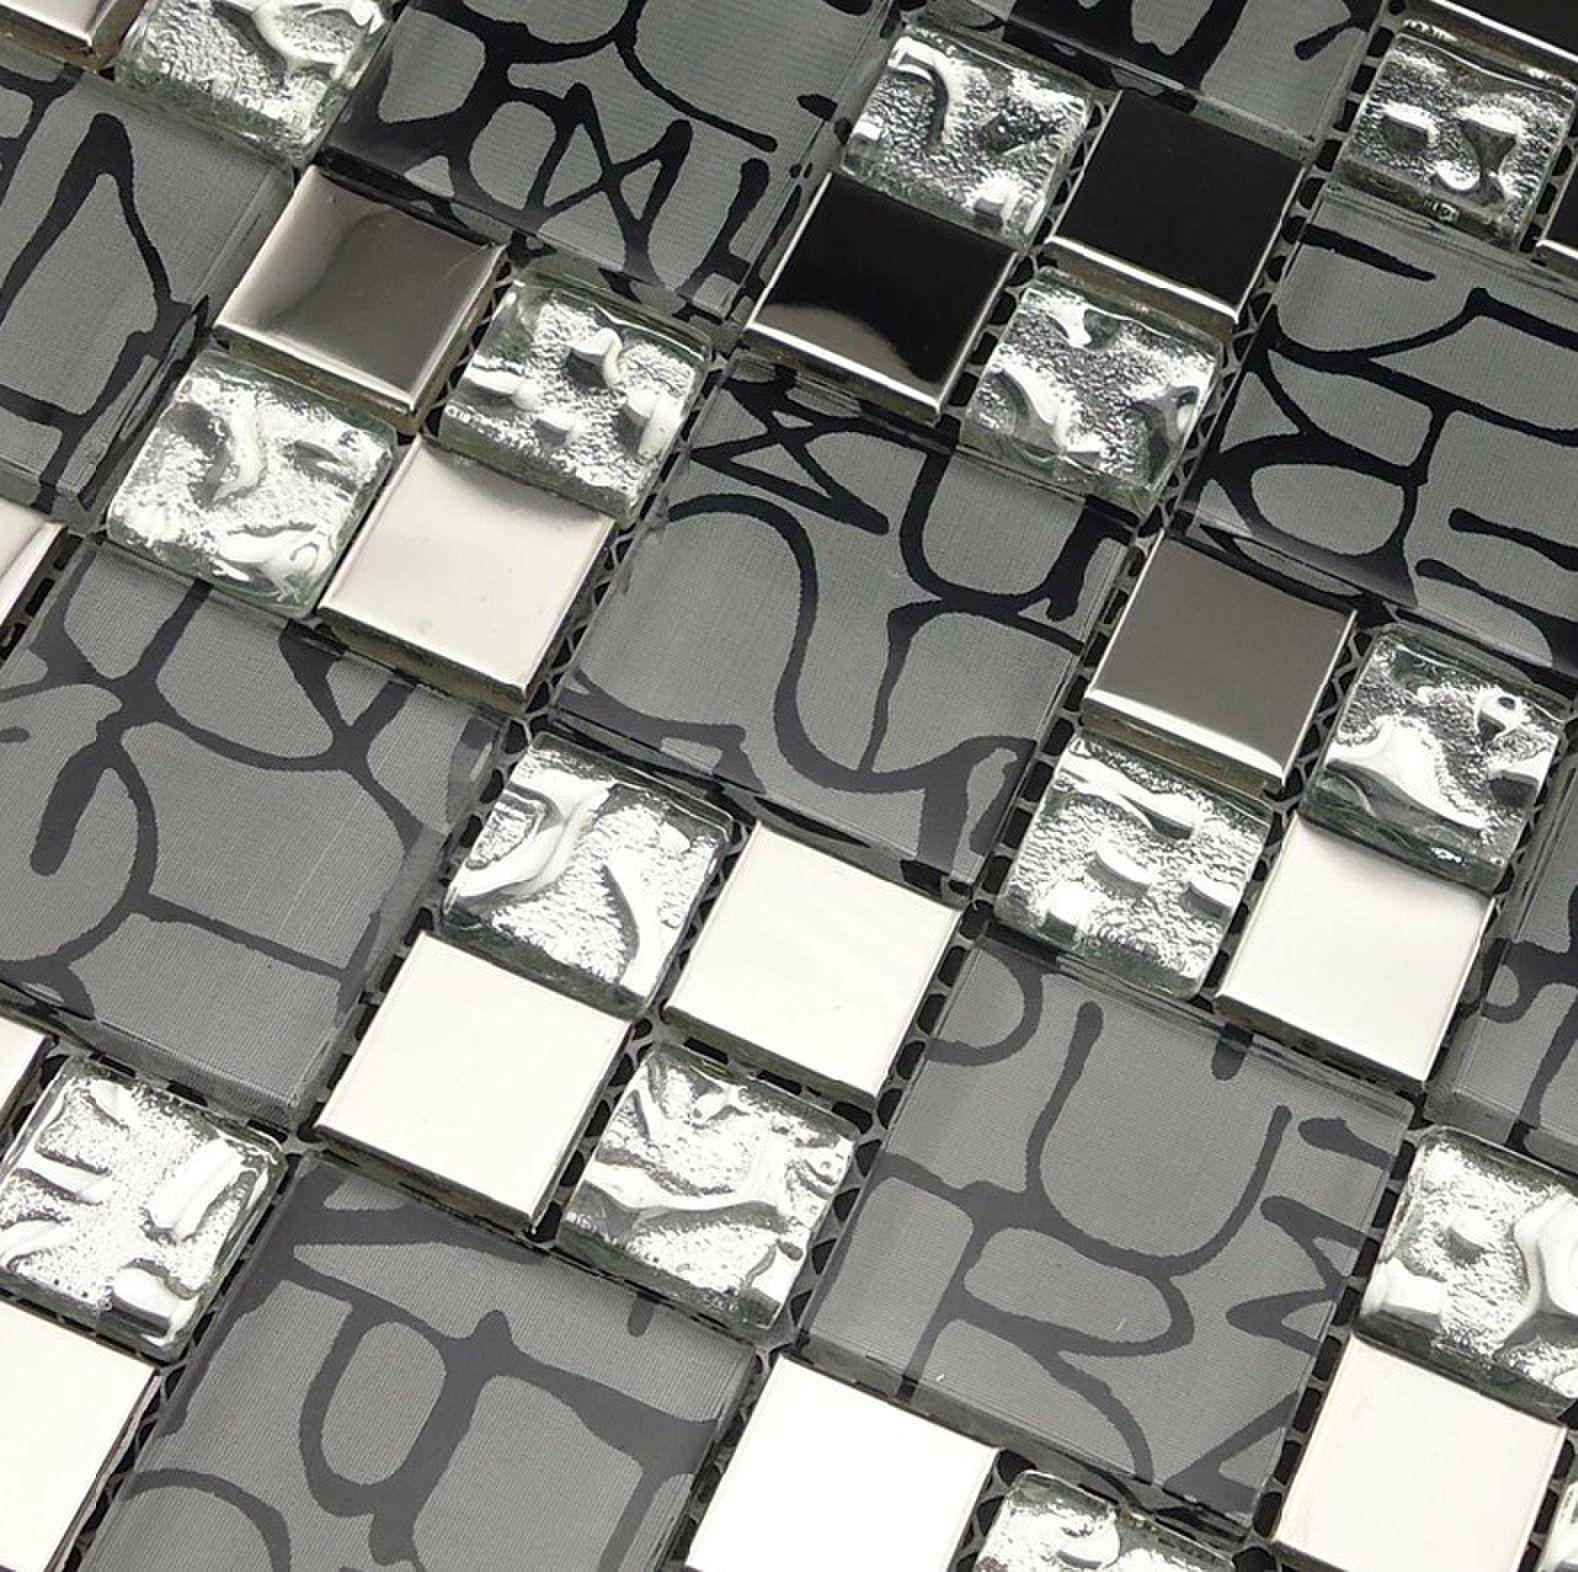 Stainless steel tile backsplash SSMT266 kitchen mosaic glass wall tiles FREE SHIPPING metal black glass mosaics